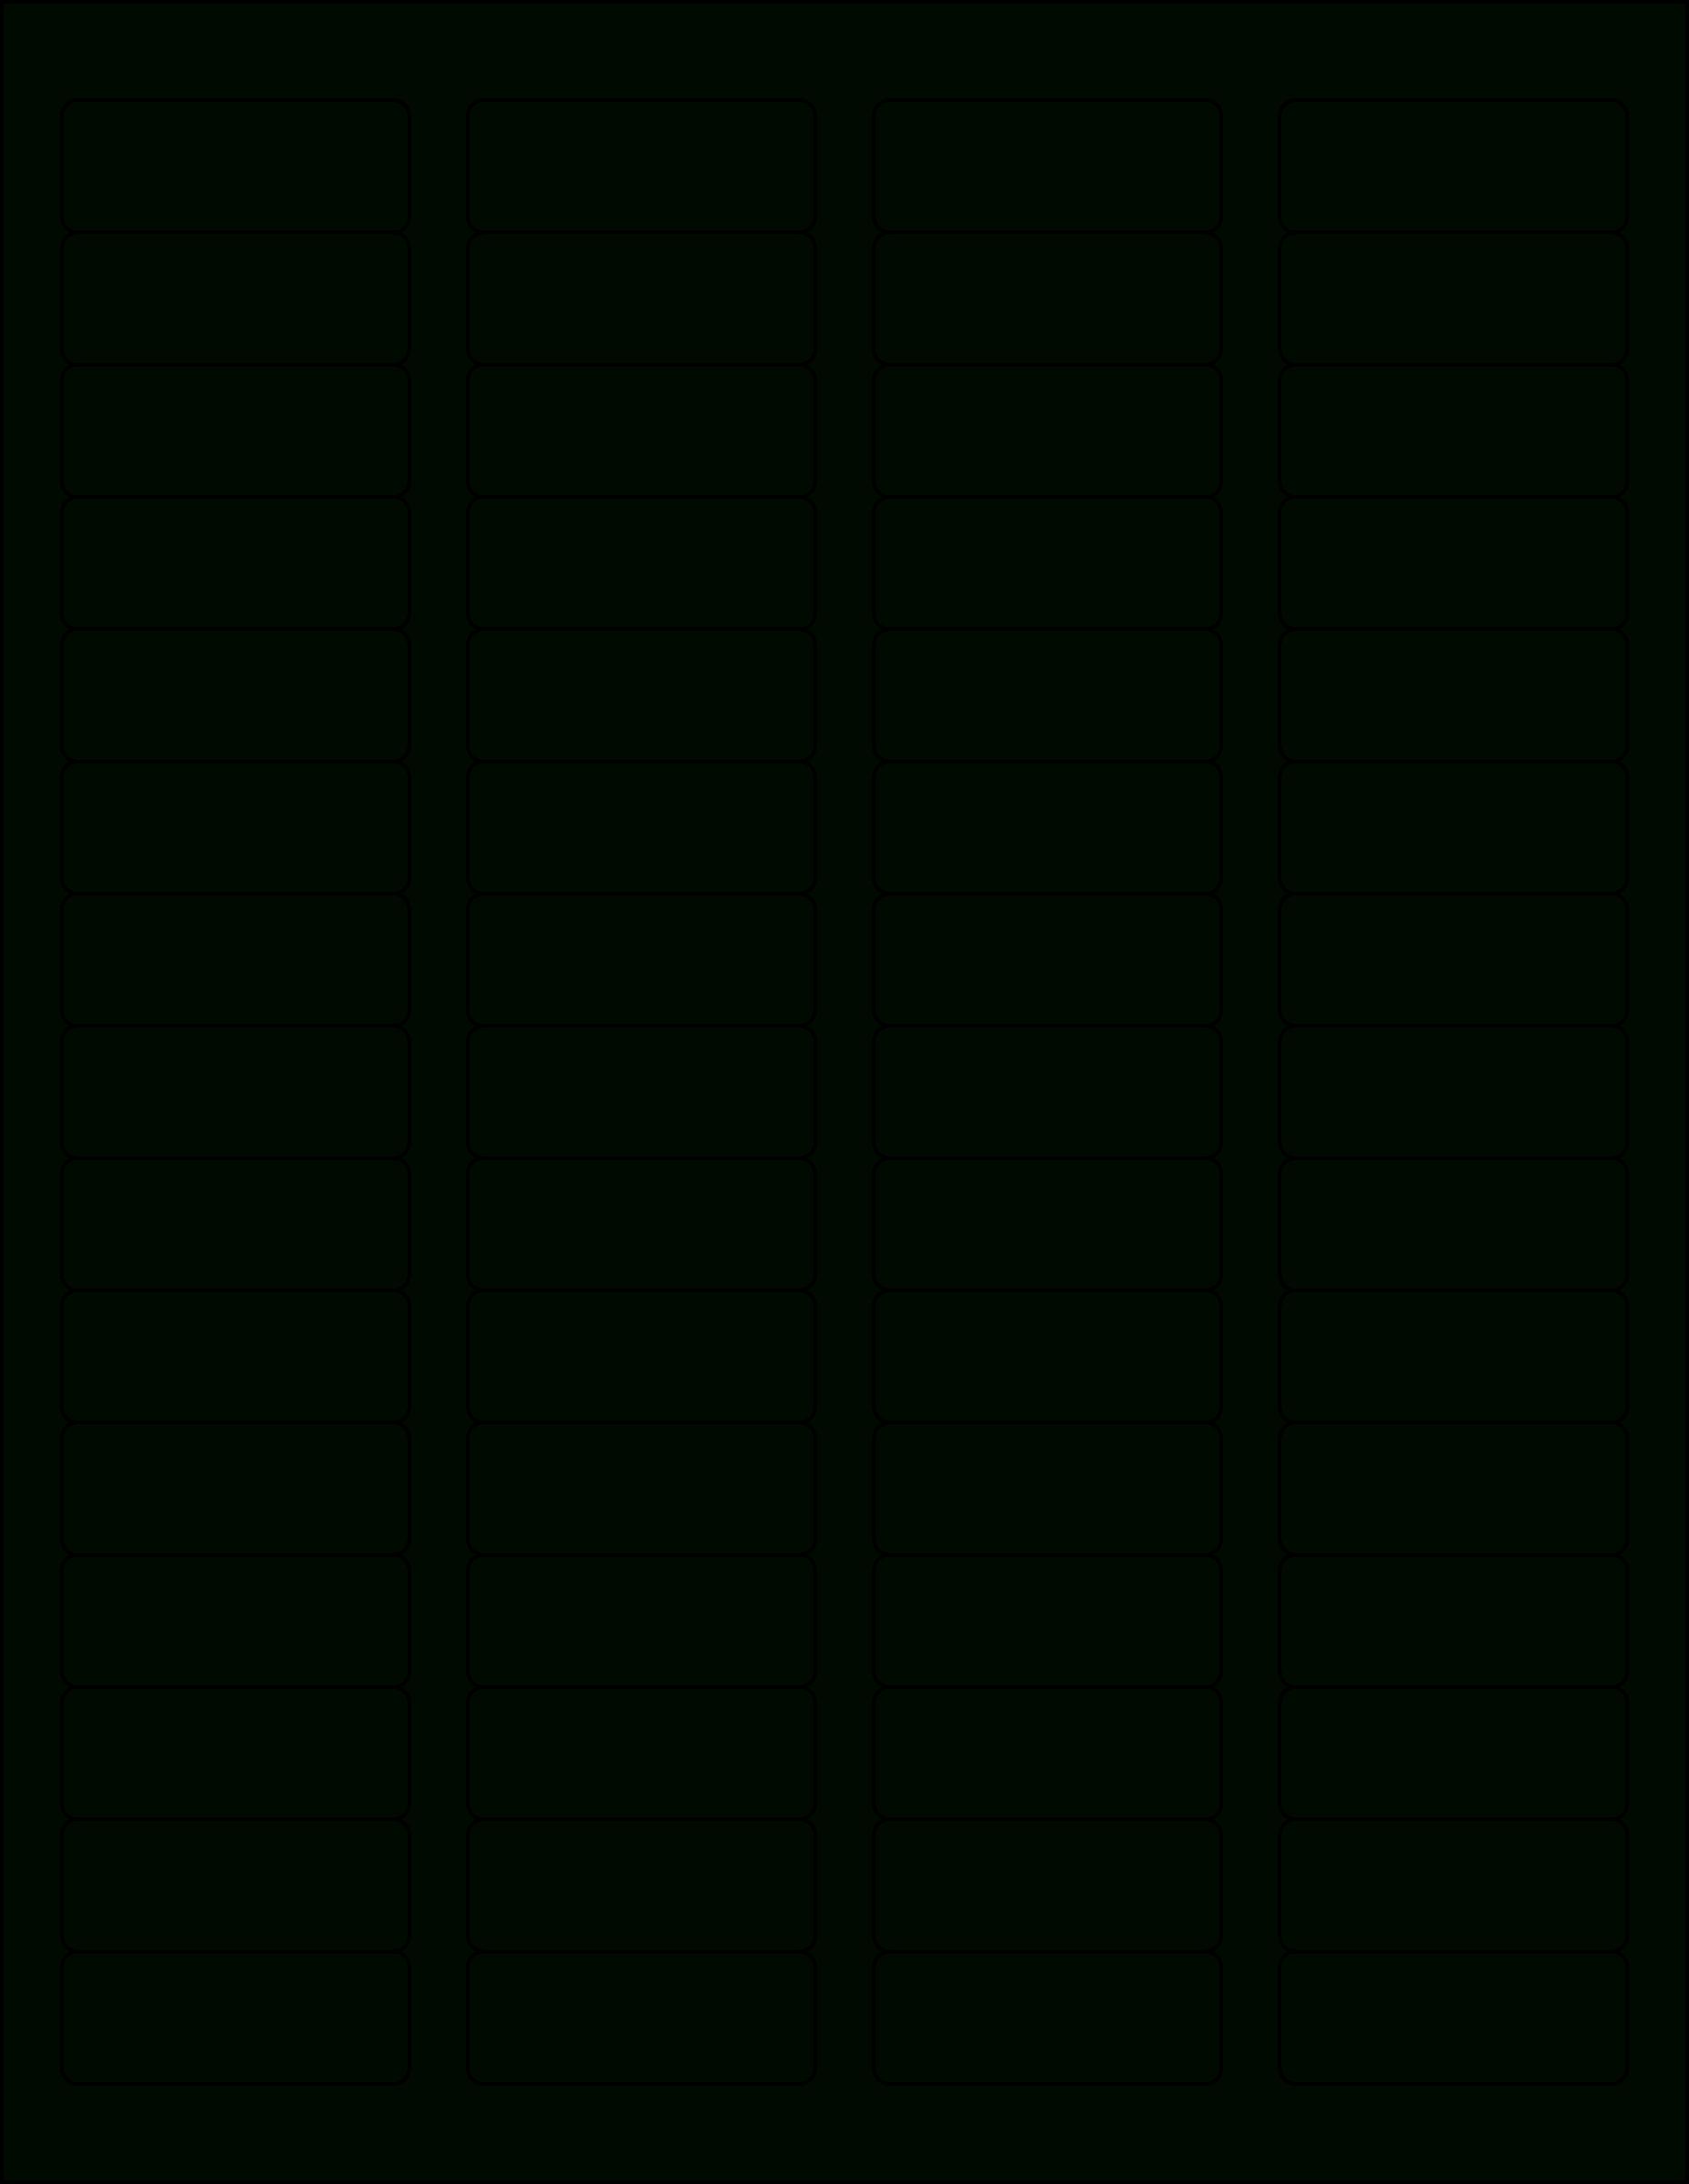 vector transparent library Address label clipart. Transparent